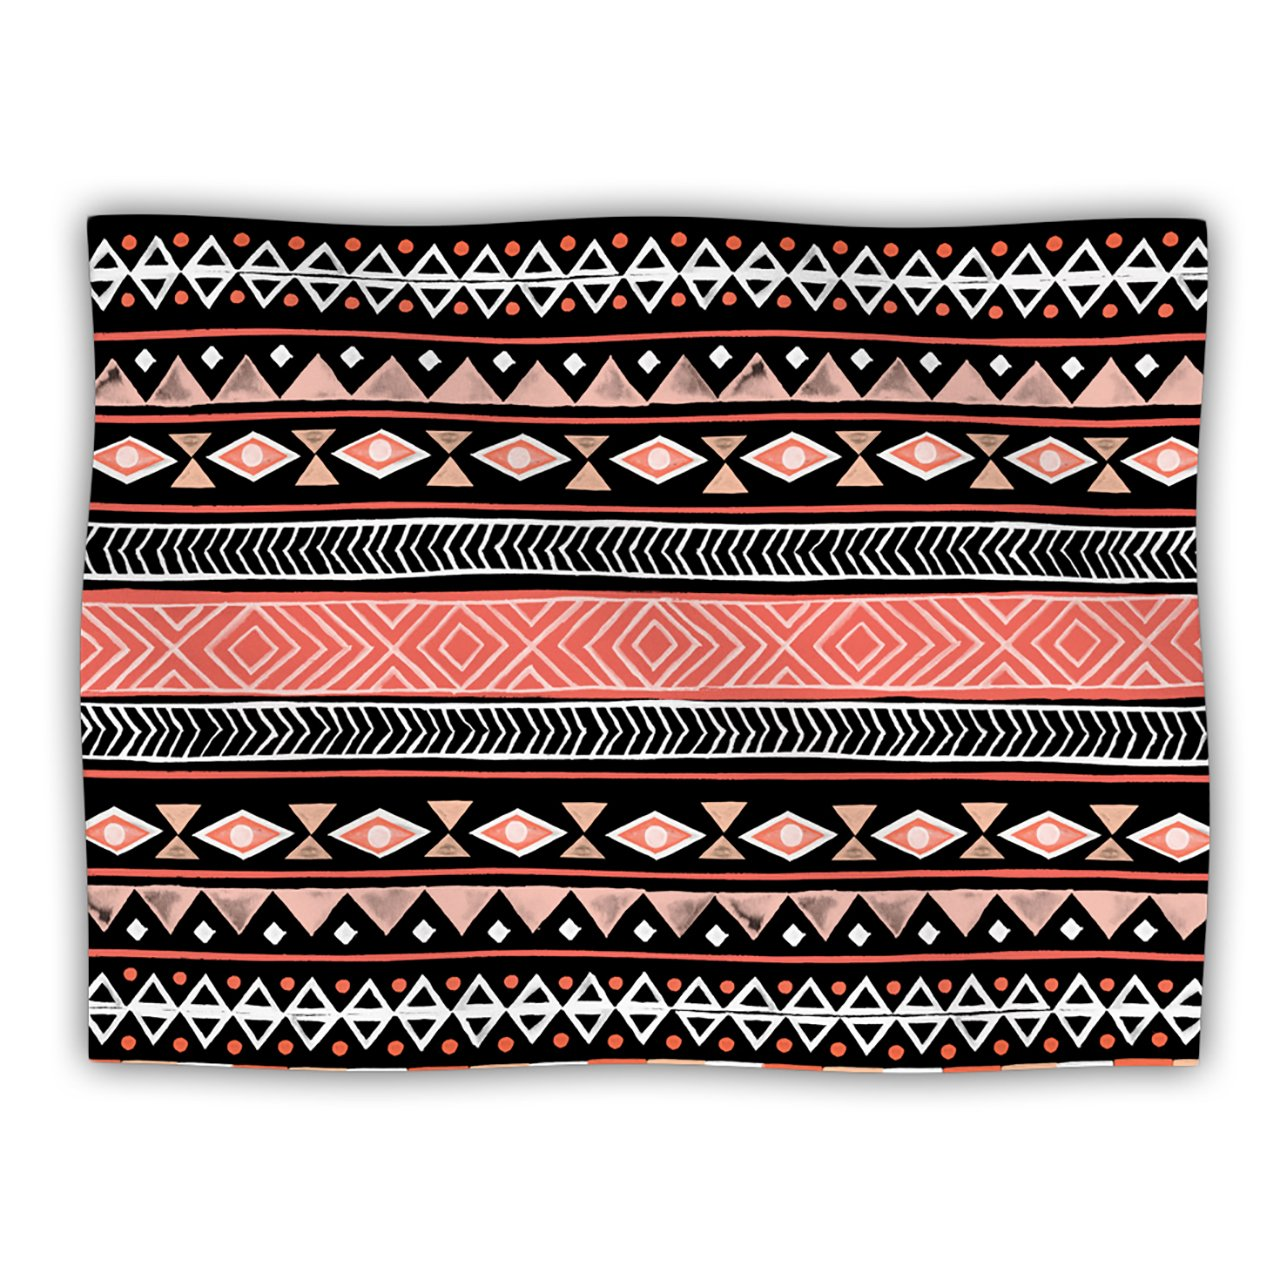 Kess InHouse Skye Zambrana Mojave Black  Black Red Pet Blanket, 60 by 50-Inch